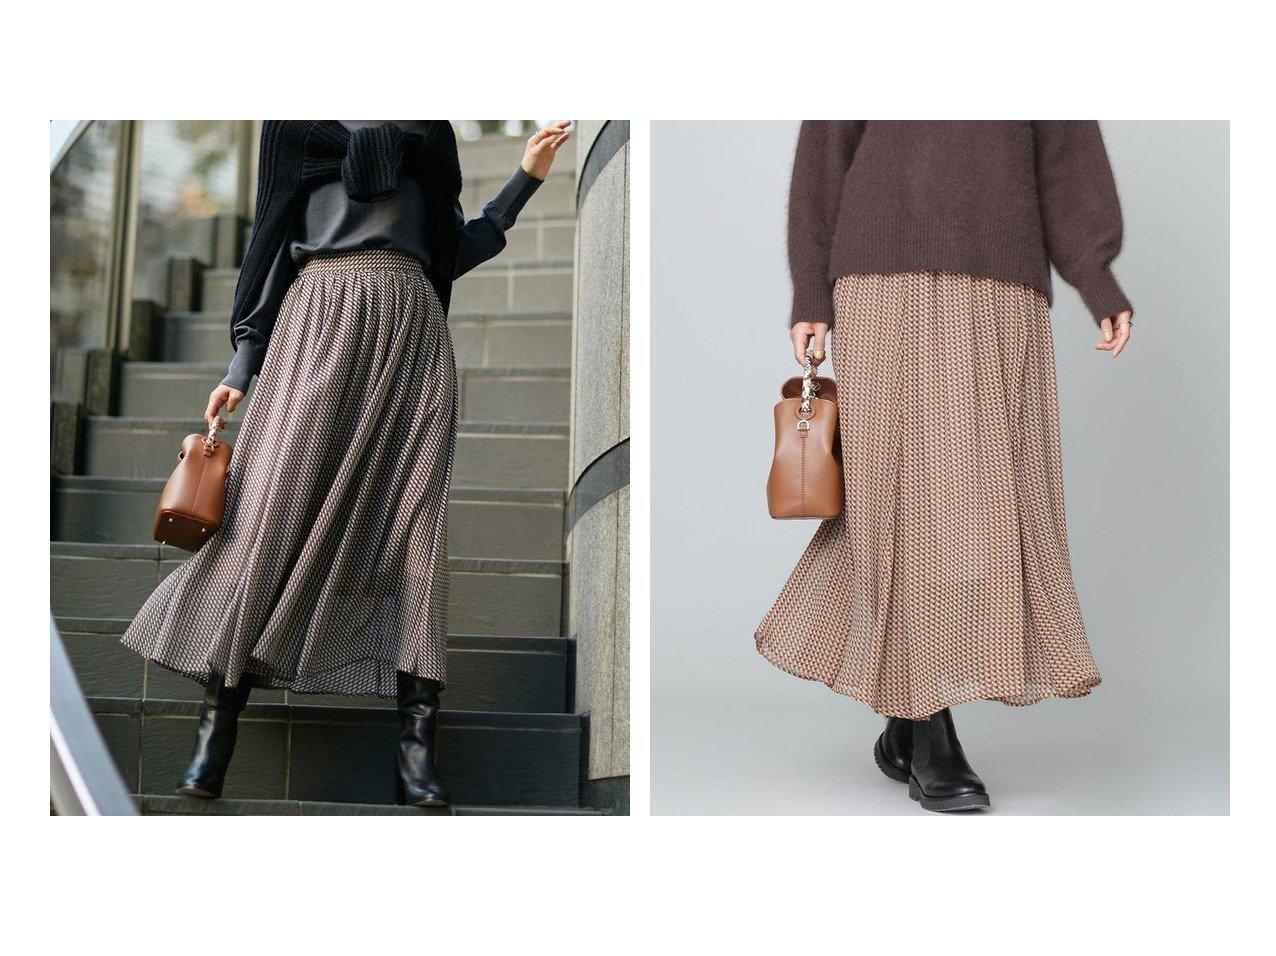 【nano universe/ナノ ユニバース】の幾何プリントギャザースカート スカートのおすすめ!人気、トレンド・レディースファッションの通販 おすすめで人気の流行・トレンド、ファッションの通販商品 メンズファッション・キッズファッション・インテリア・家具・レディースファッション・服の通販 founy(ファニー) https://founy.com/ ファッション Fashion レディースファッション WOMEN スカート Skirt Aライン/フレアスカート Flared A-Line Skirts ウォッシャブル ギャザー シアー シフォン ショート フレア プリント ポケット ロング NEW・新作・新着・新入荷 New Arrivals |ID:crp329100000013389